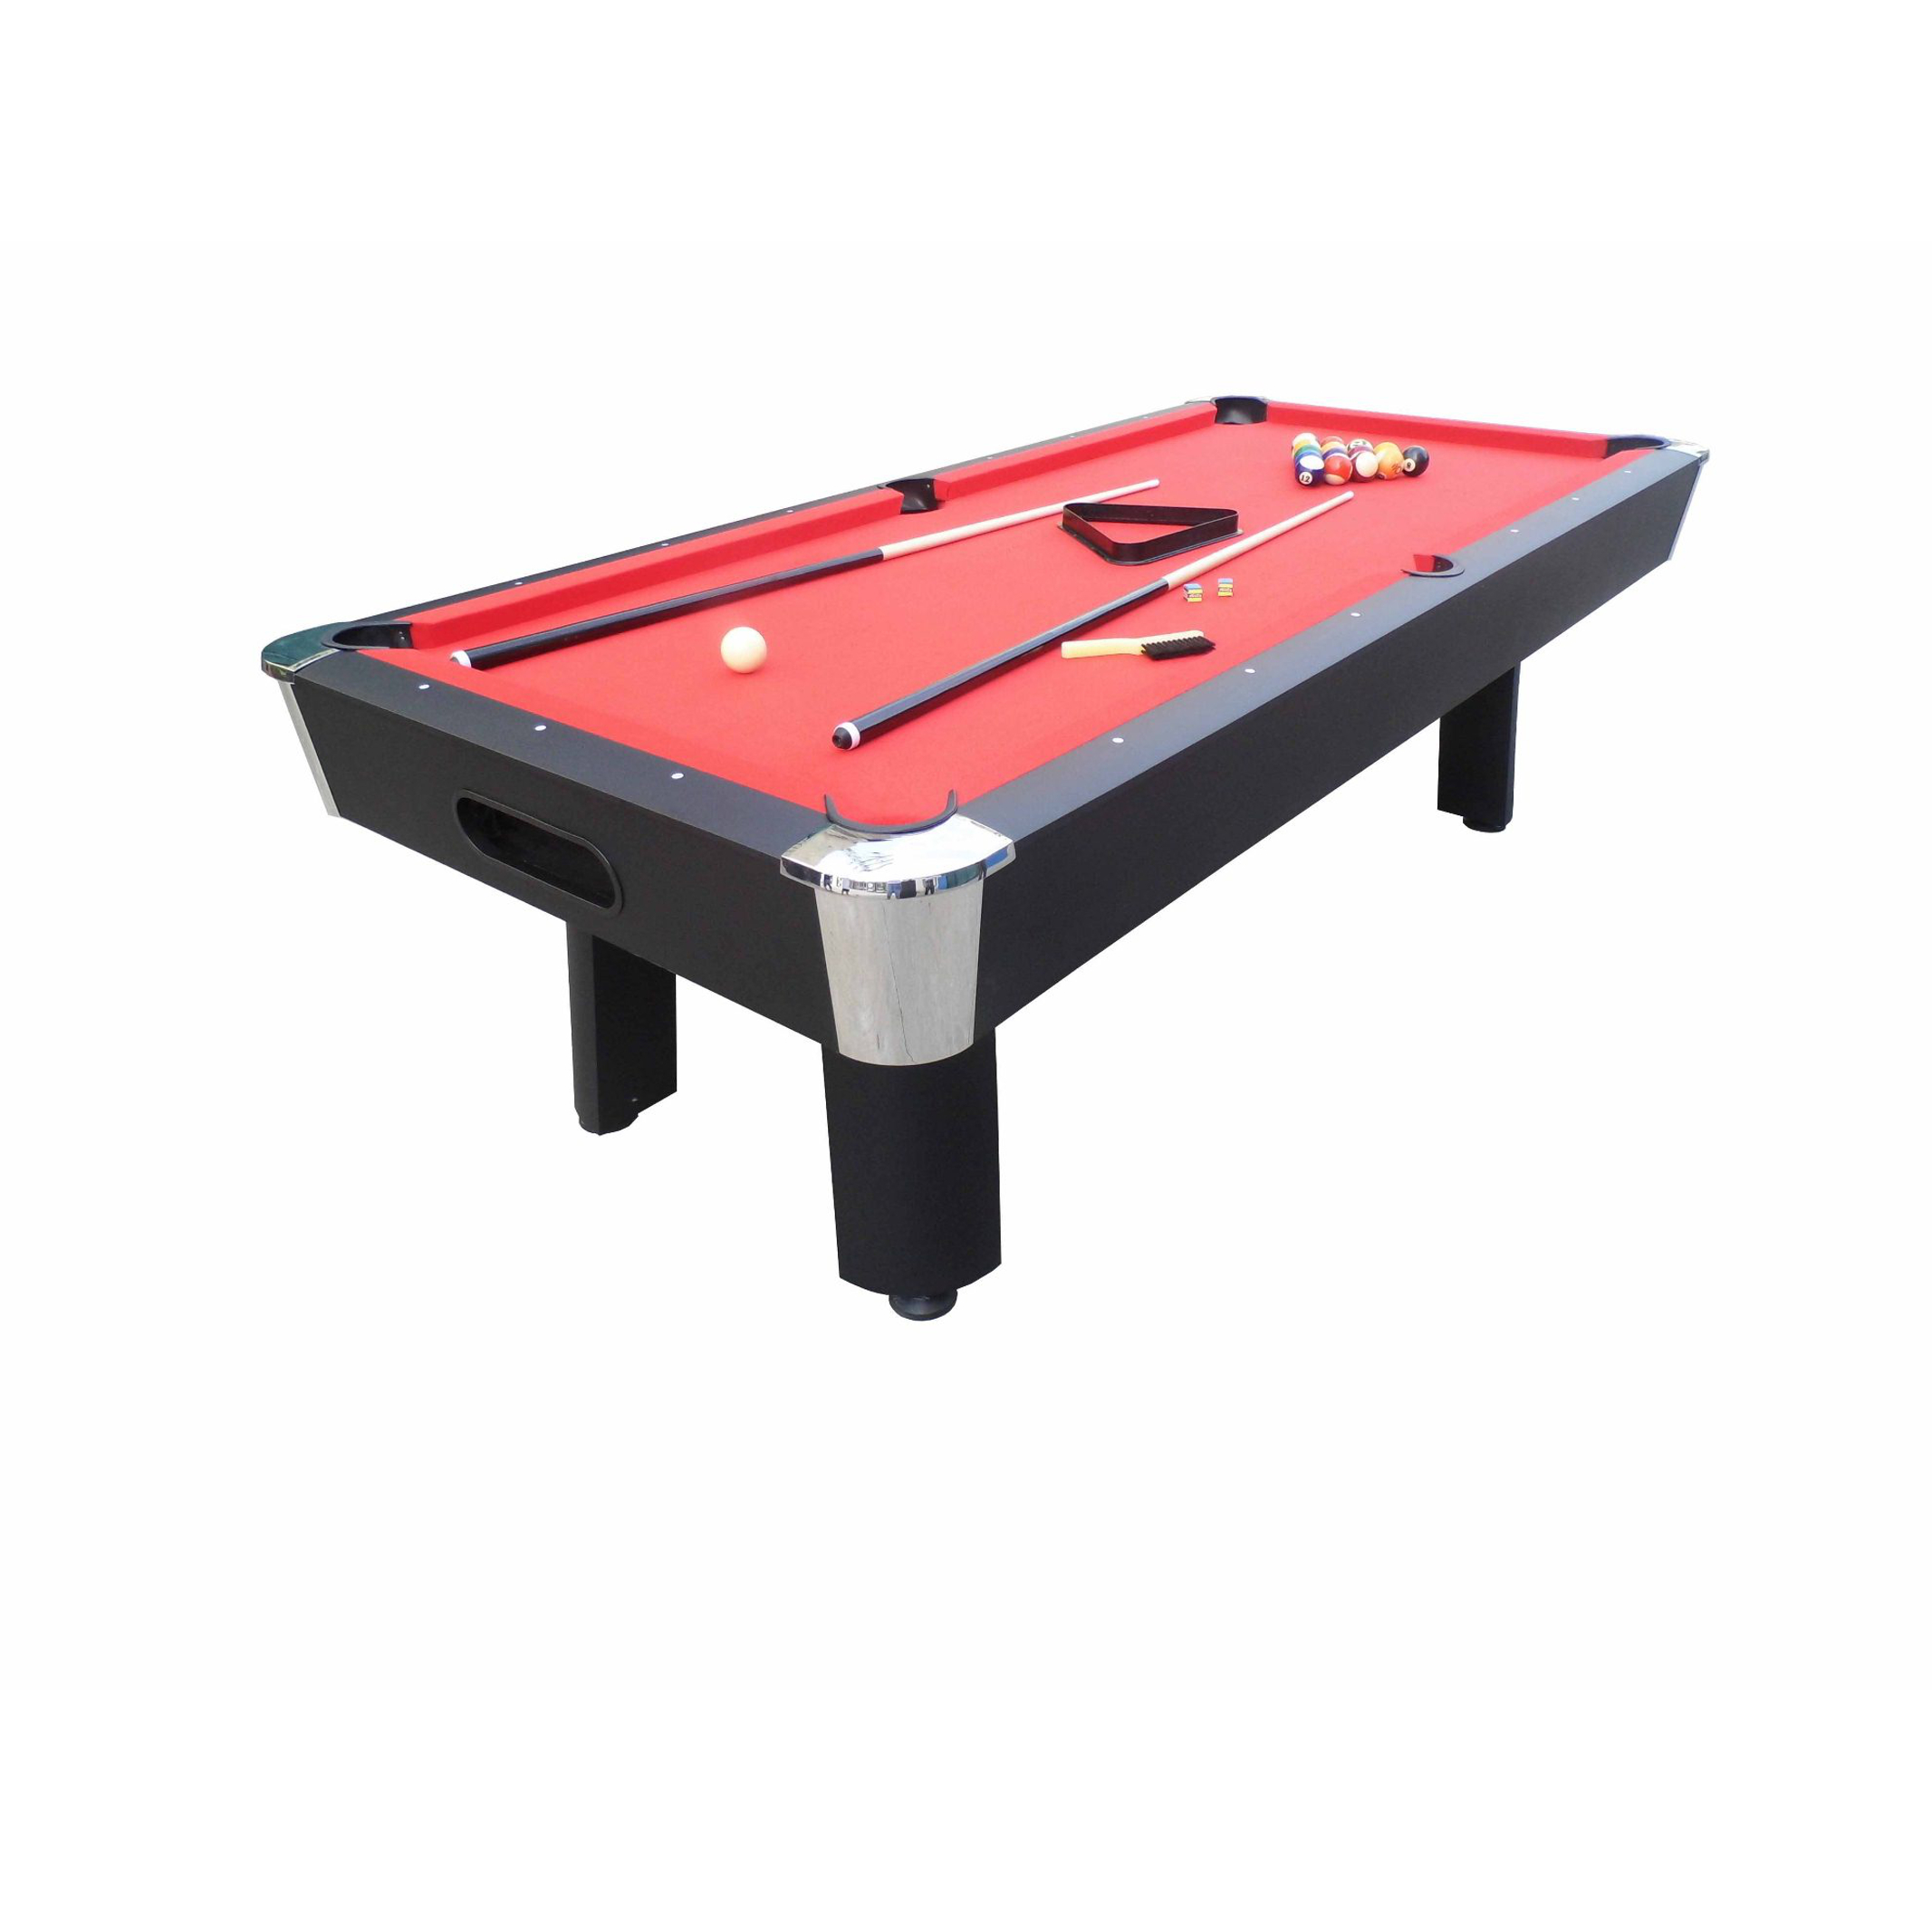 Sportcraft 7 Ft Arlington Red Billiard Table - Sears